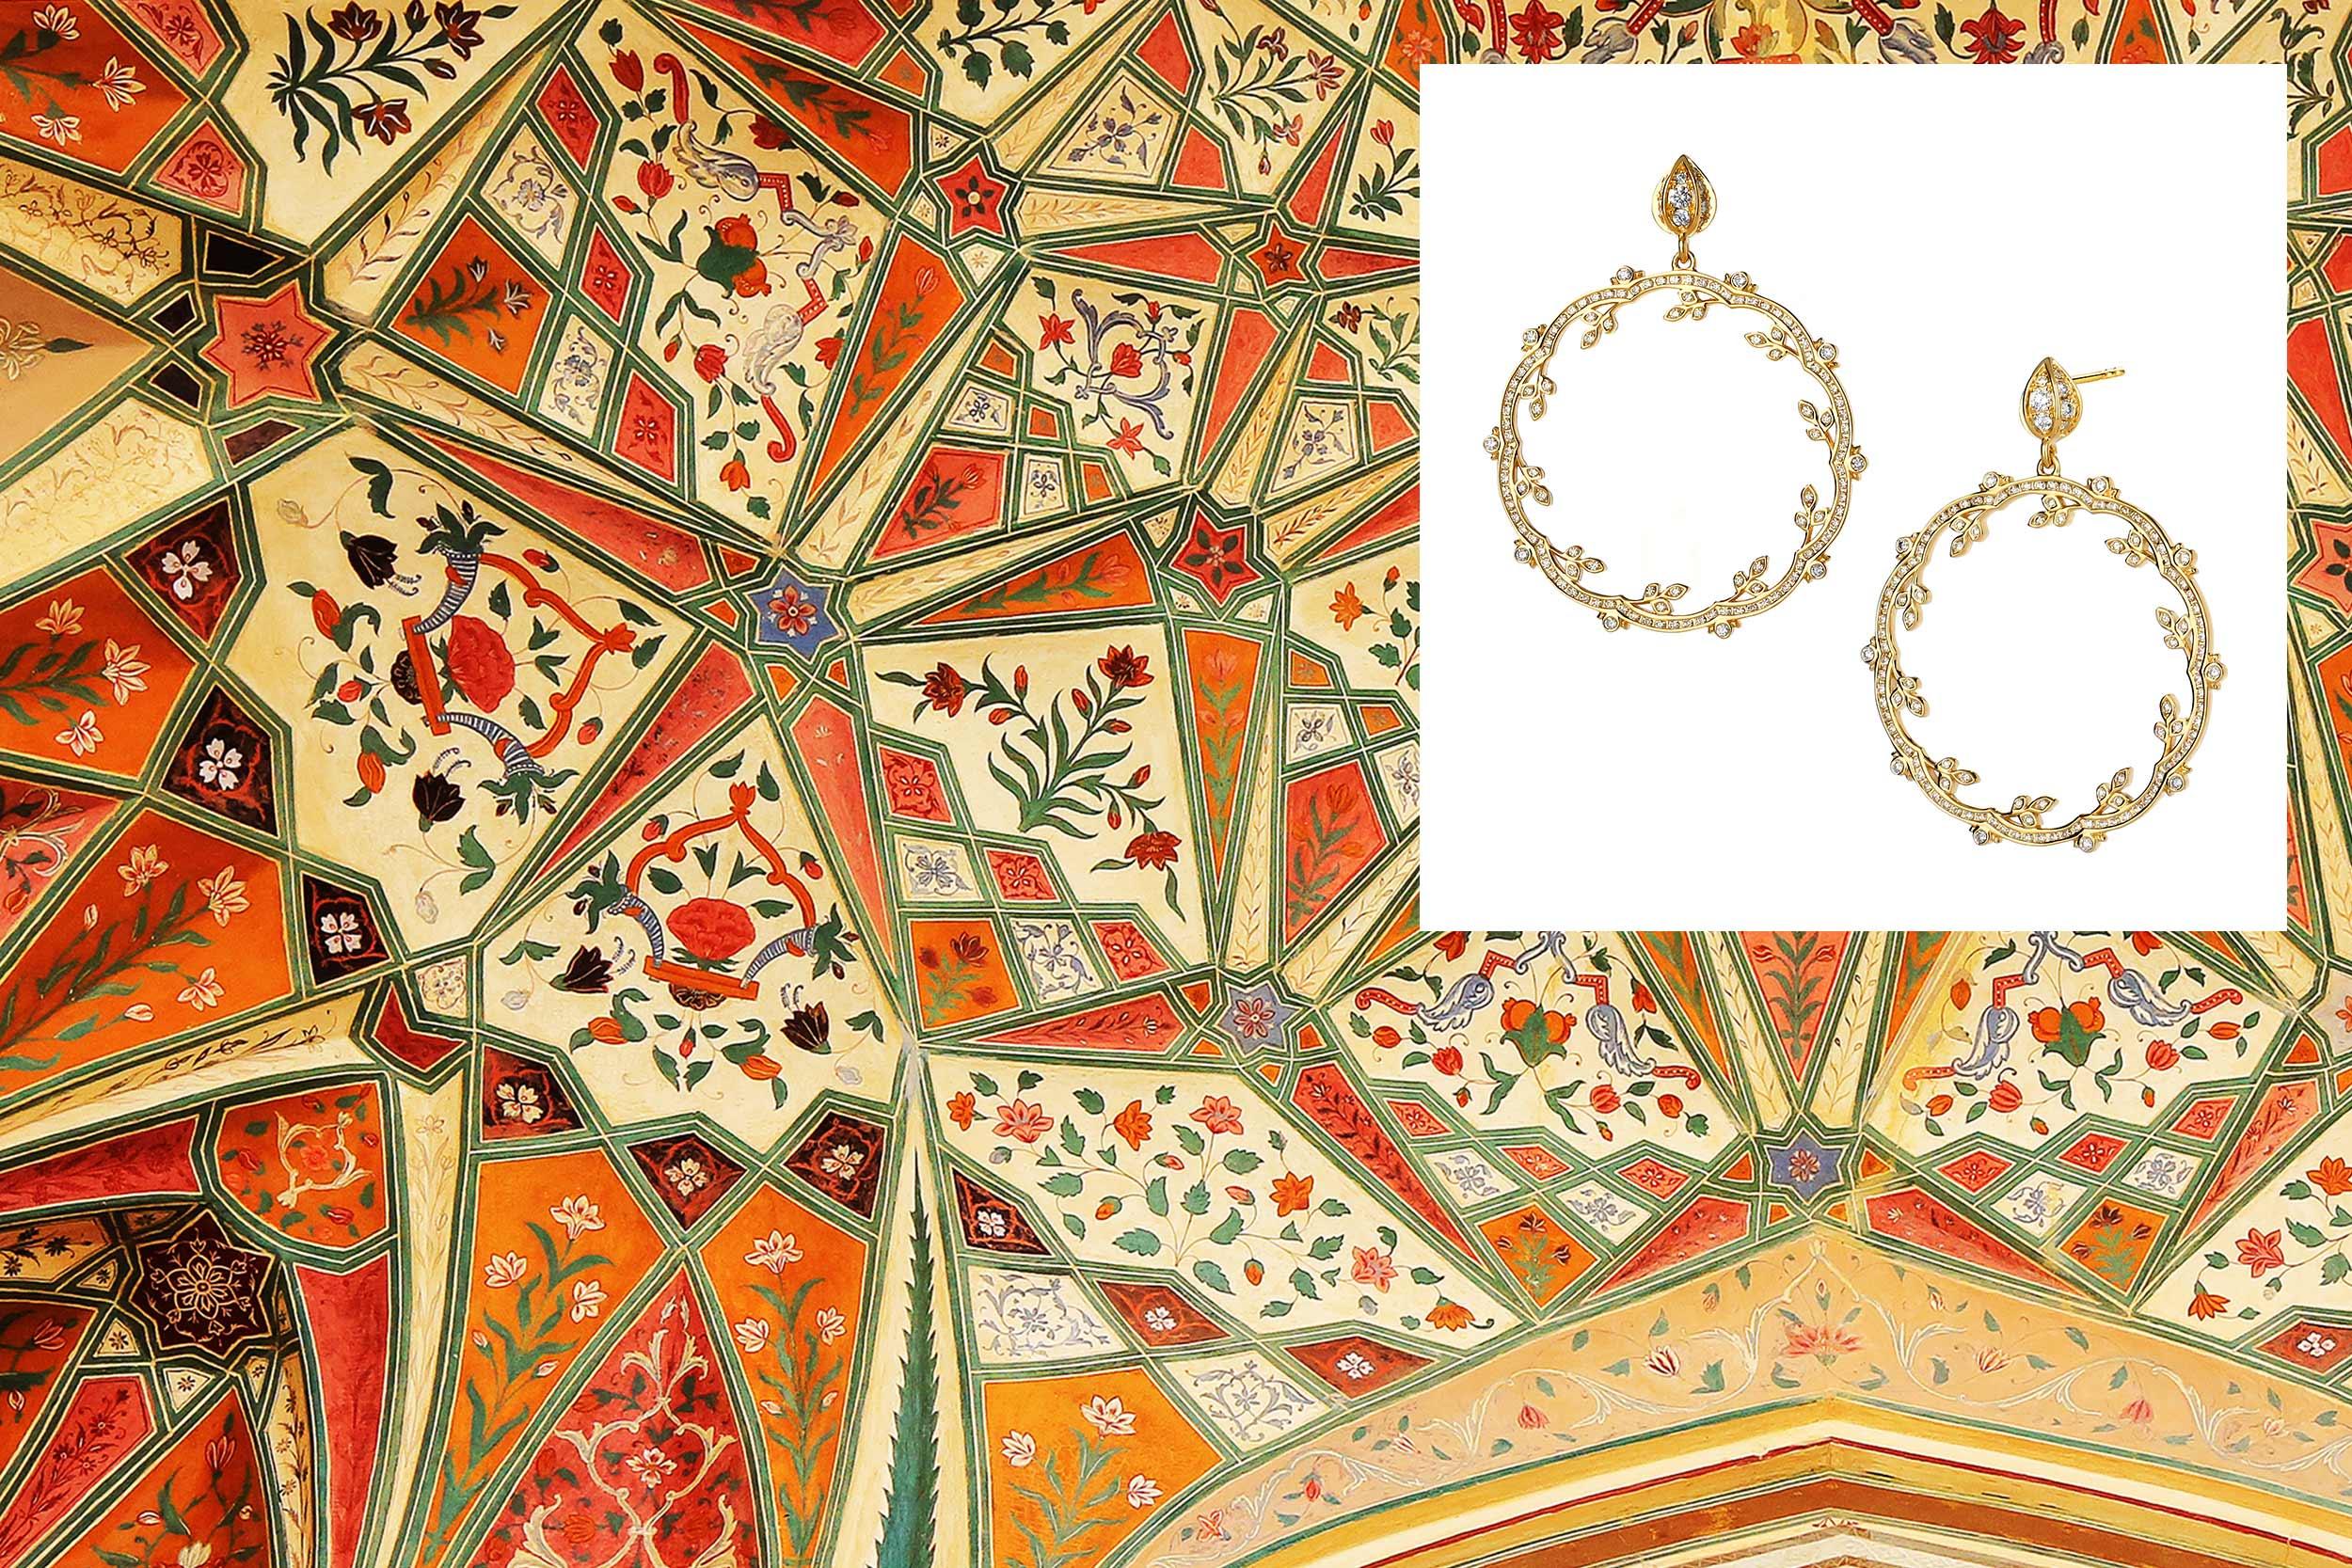 18kyg mogul twine earrings with champagne diamonds